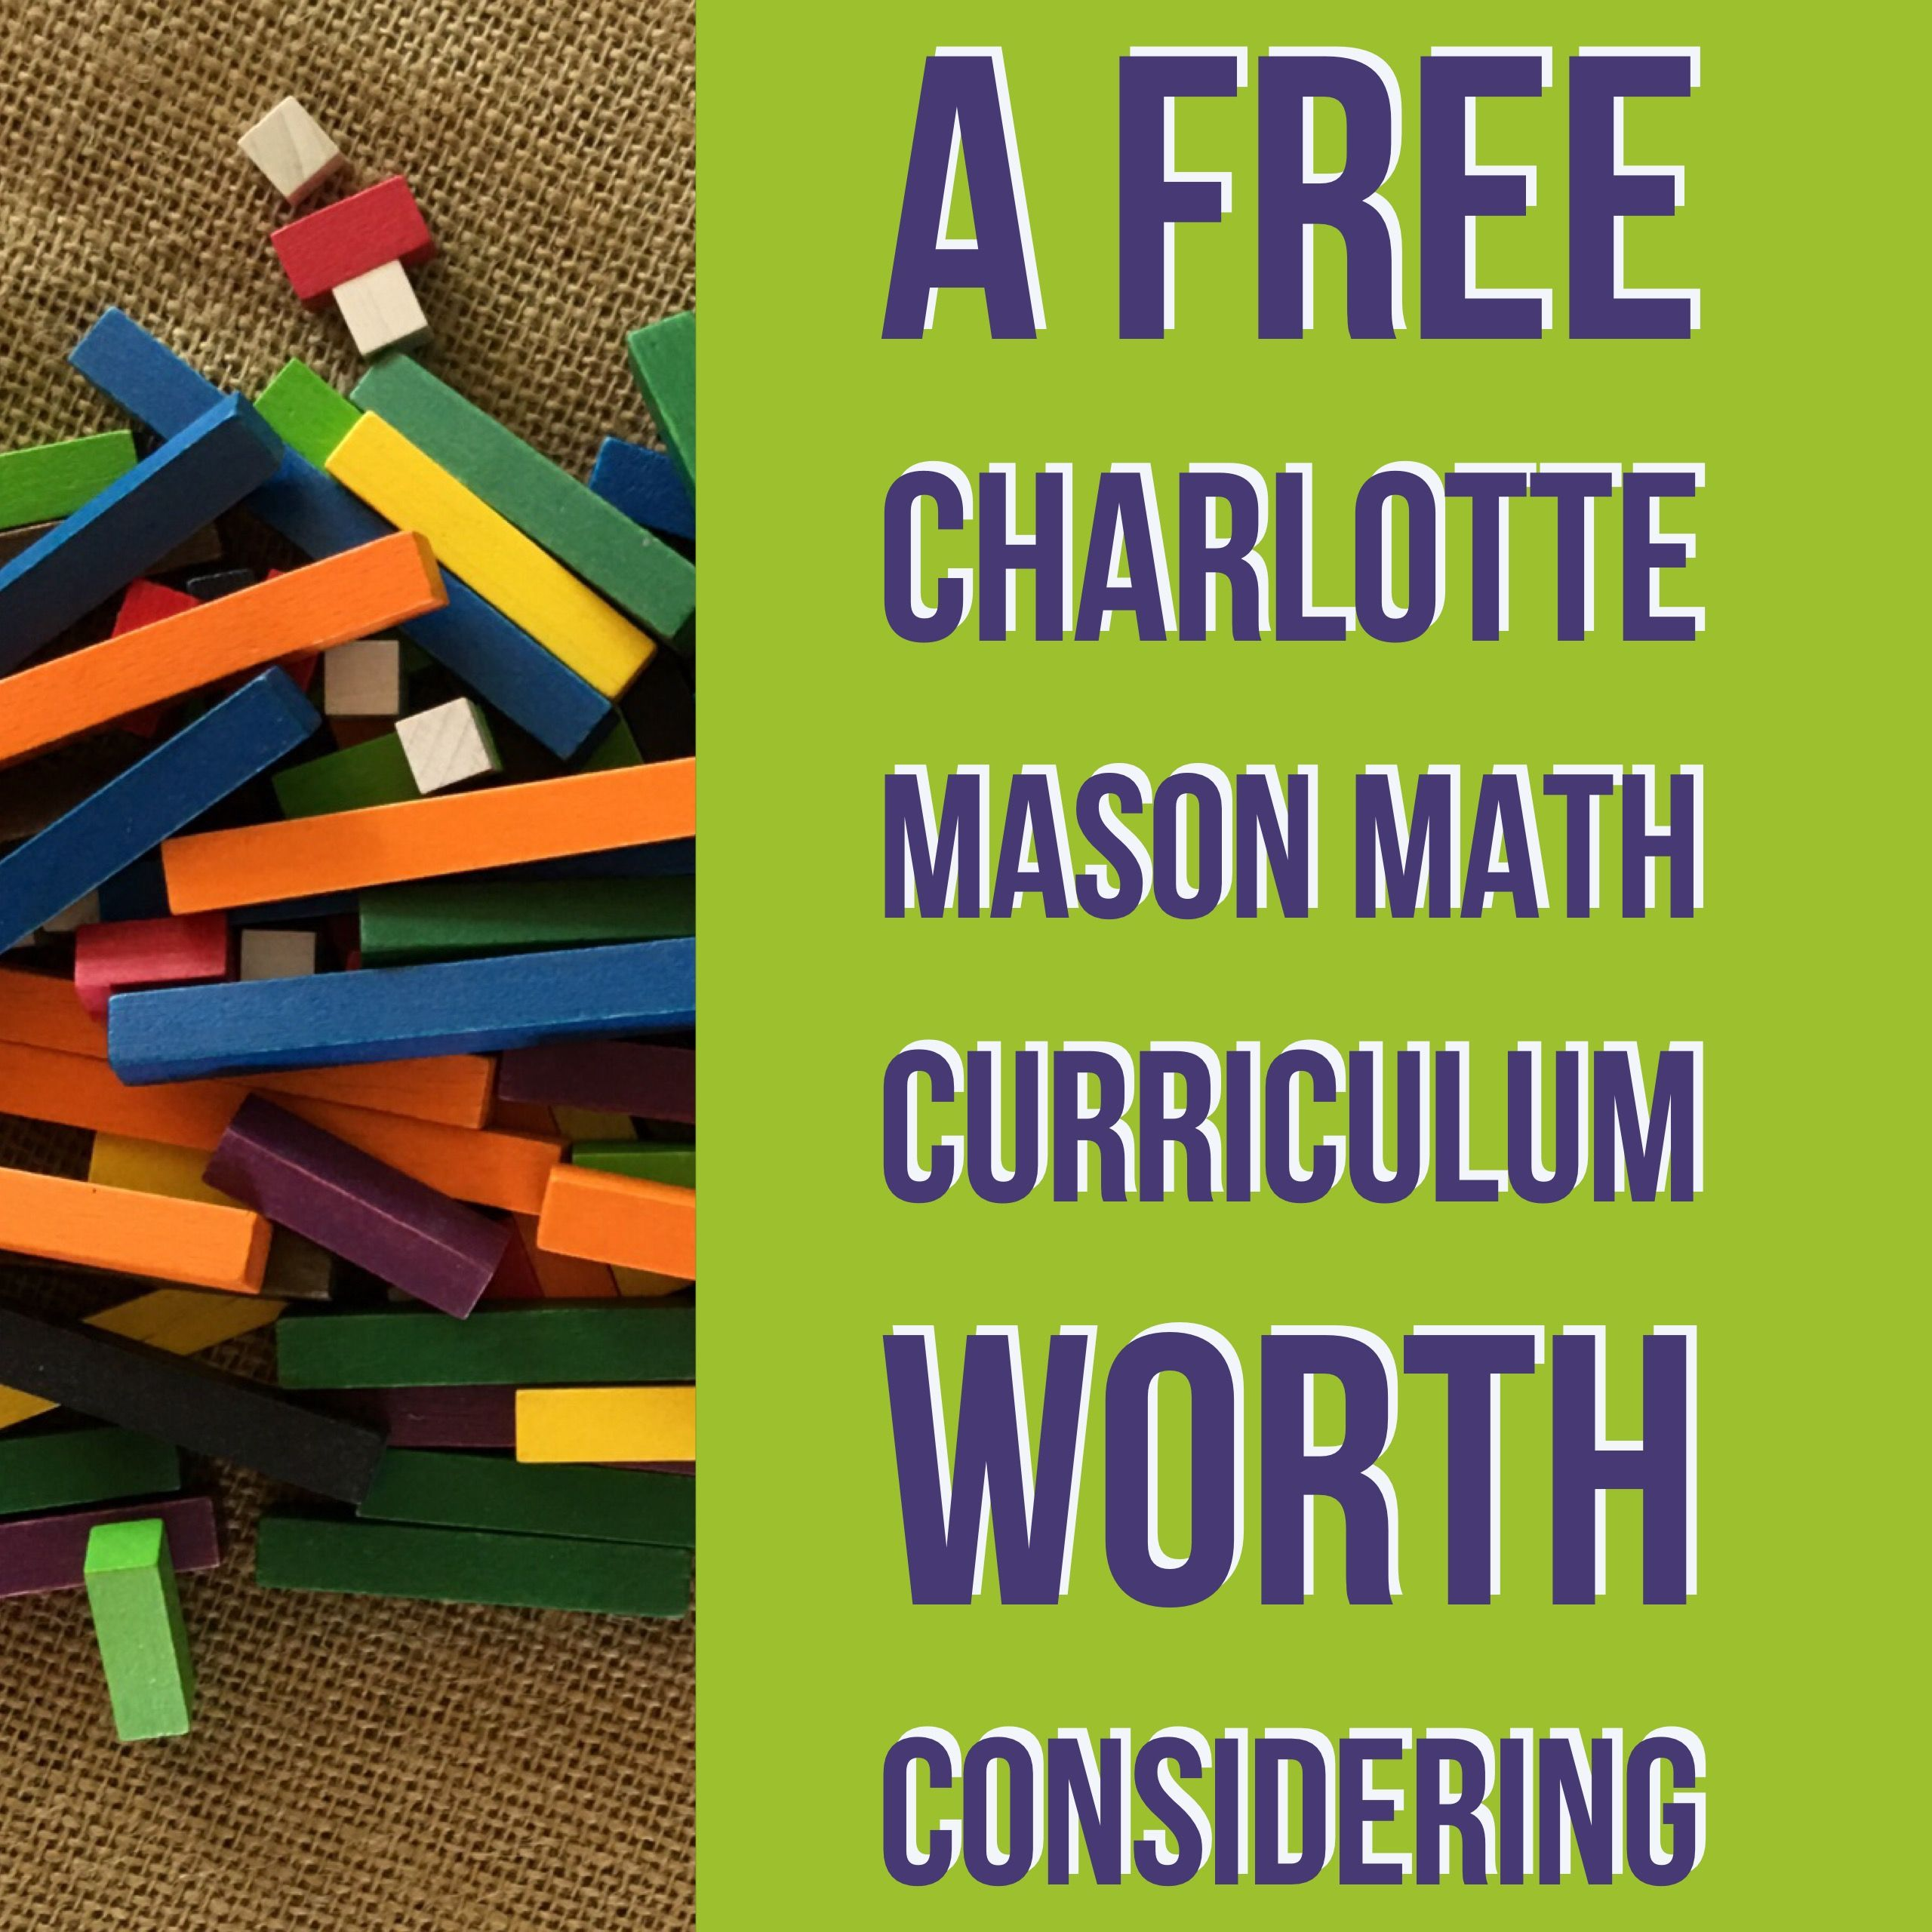 A Free Charlotte Mason Math Curriculum Worth Considering Play